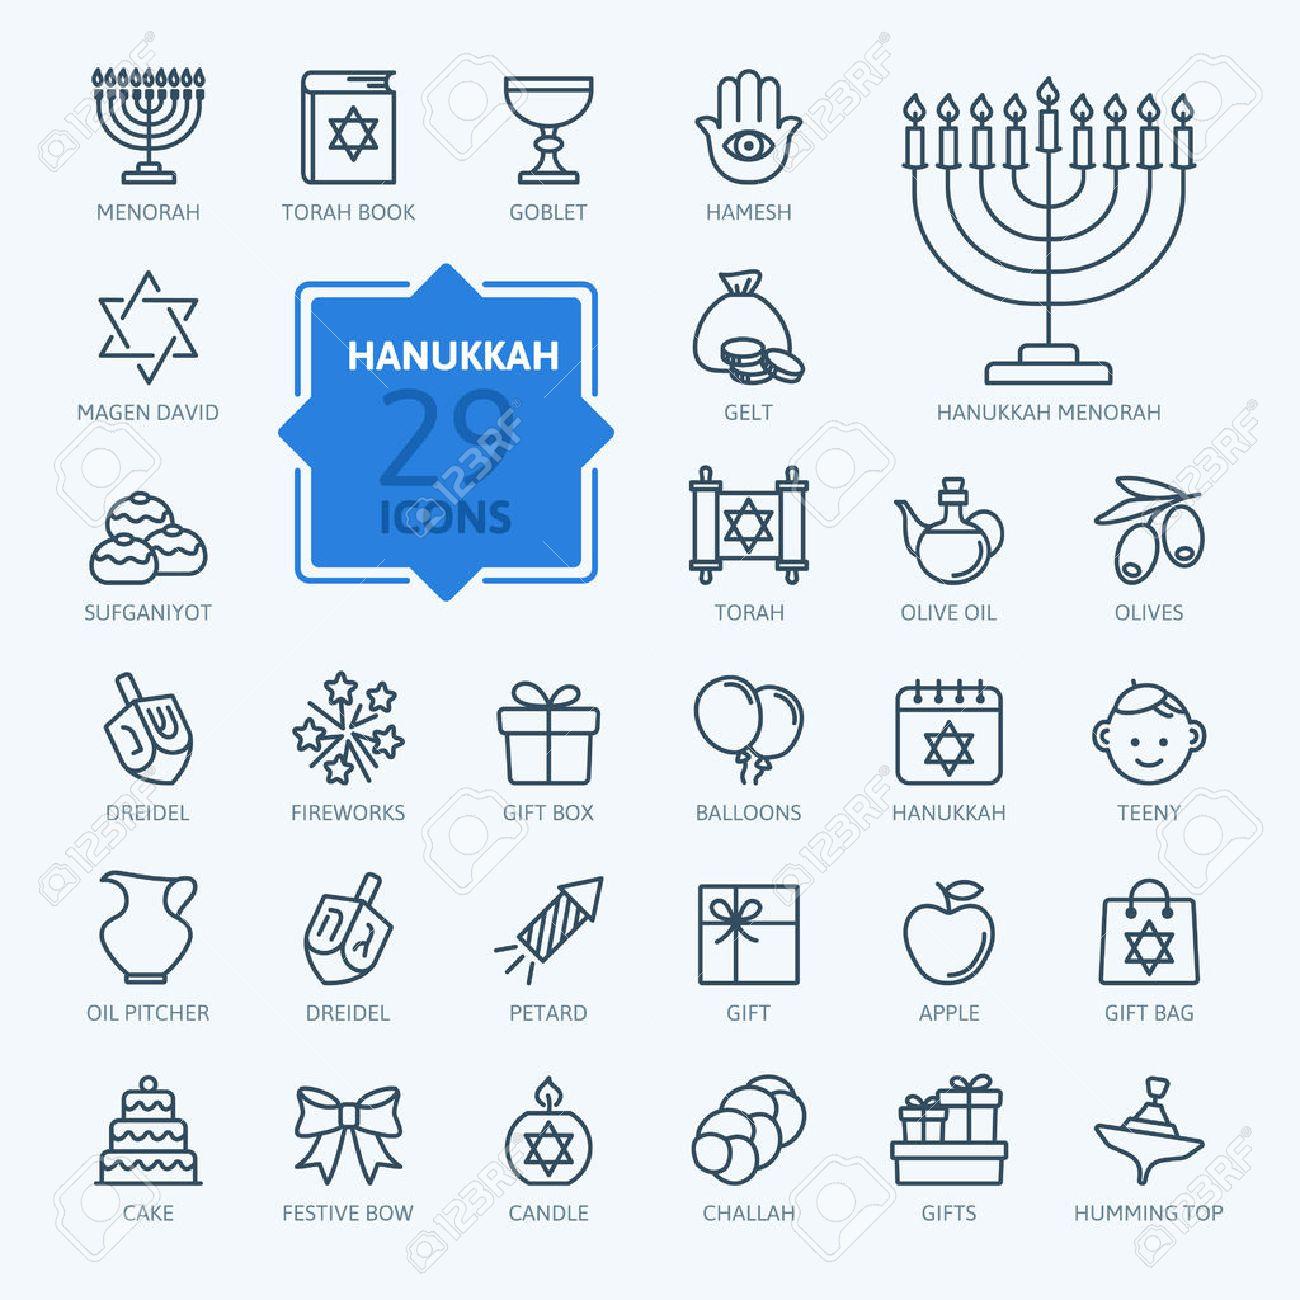 Uncategorized Chanukah Symbols outline icon collection symbols of hanukkah royalty free stock vector 52871107